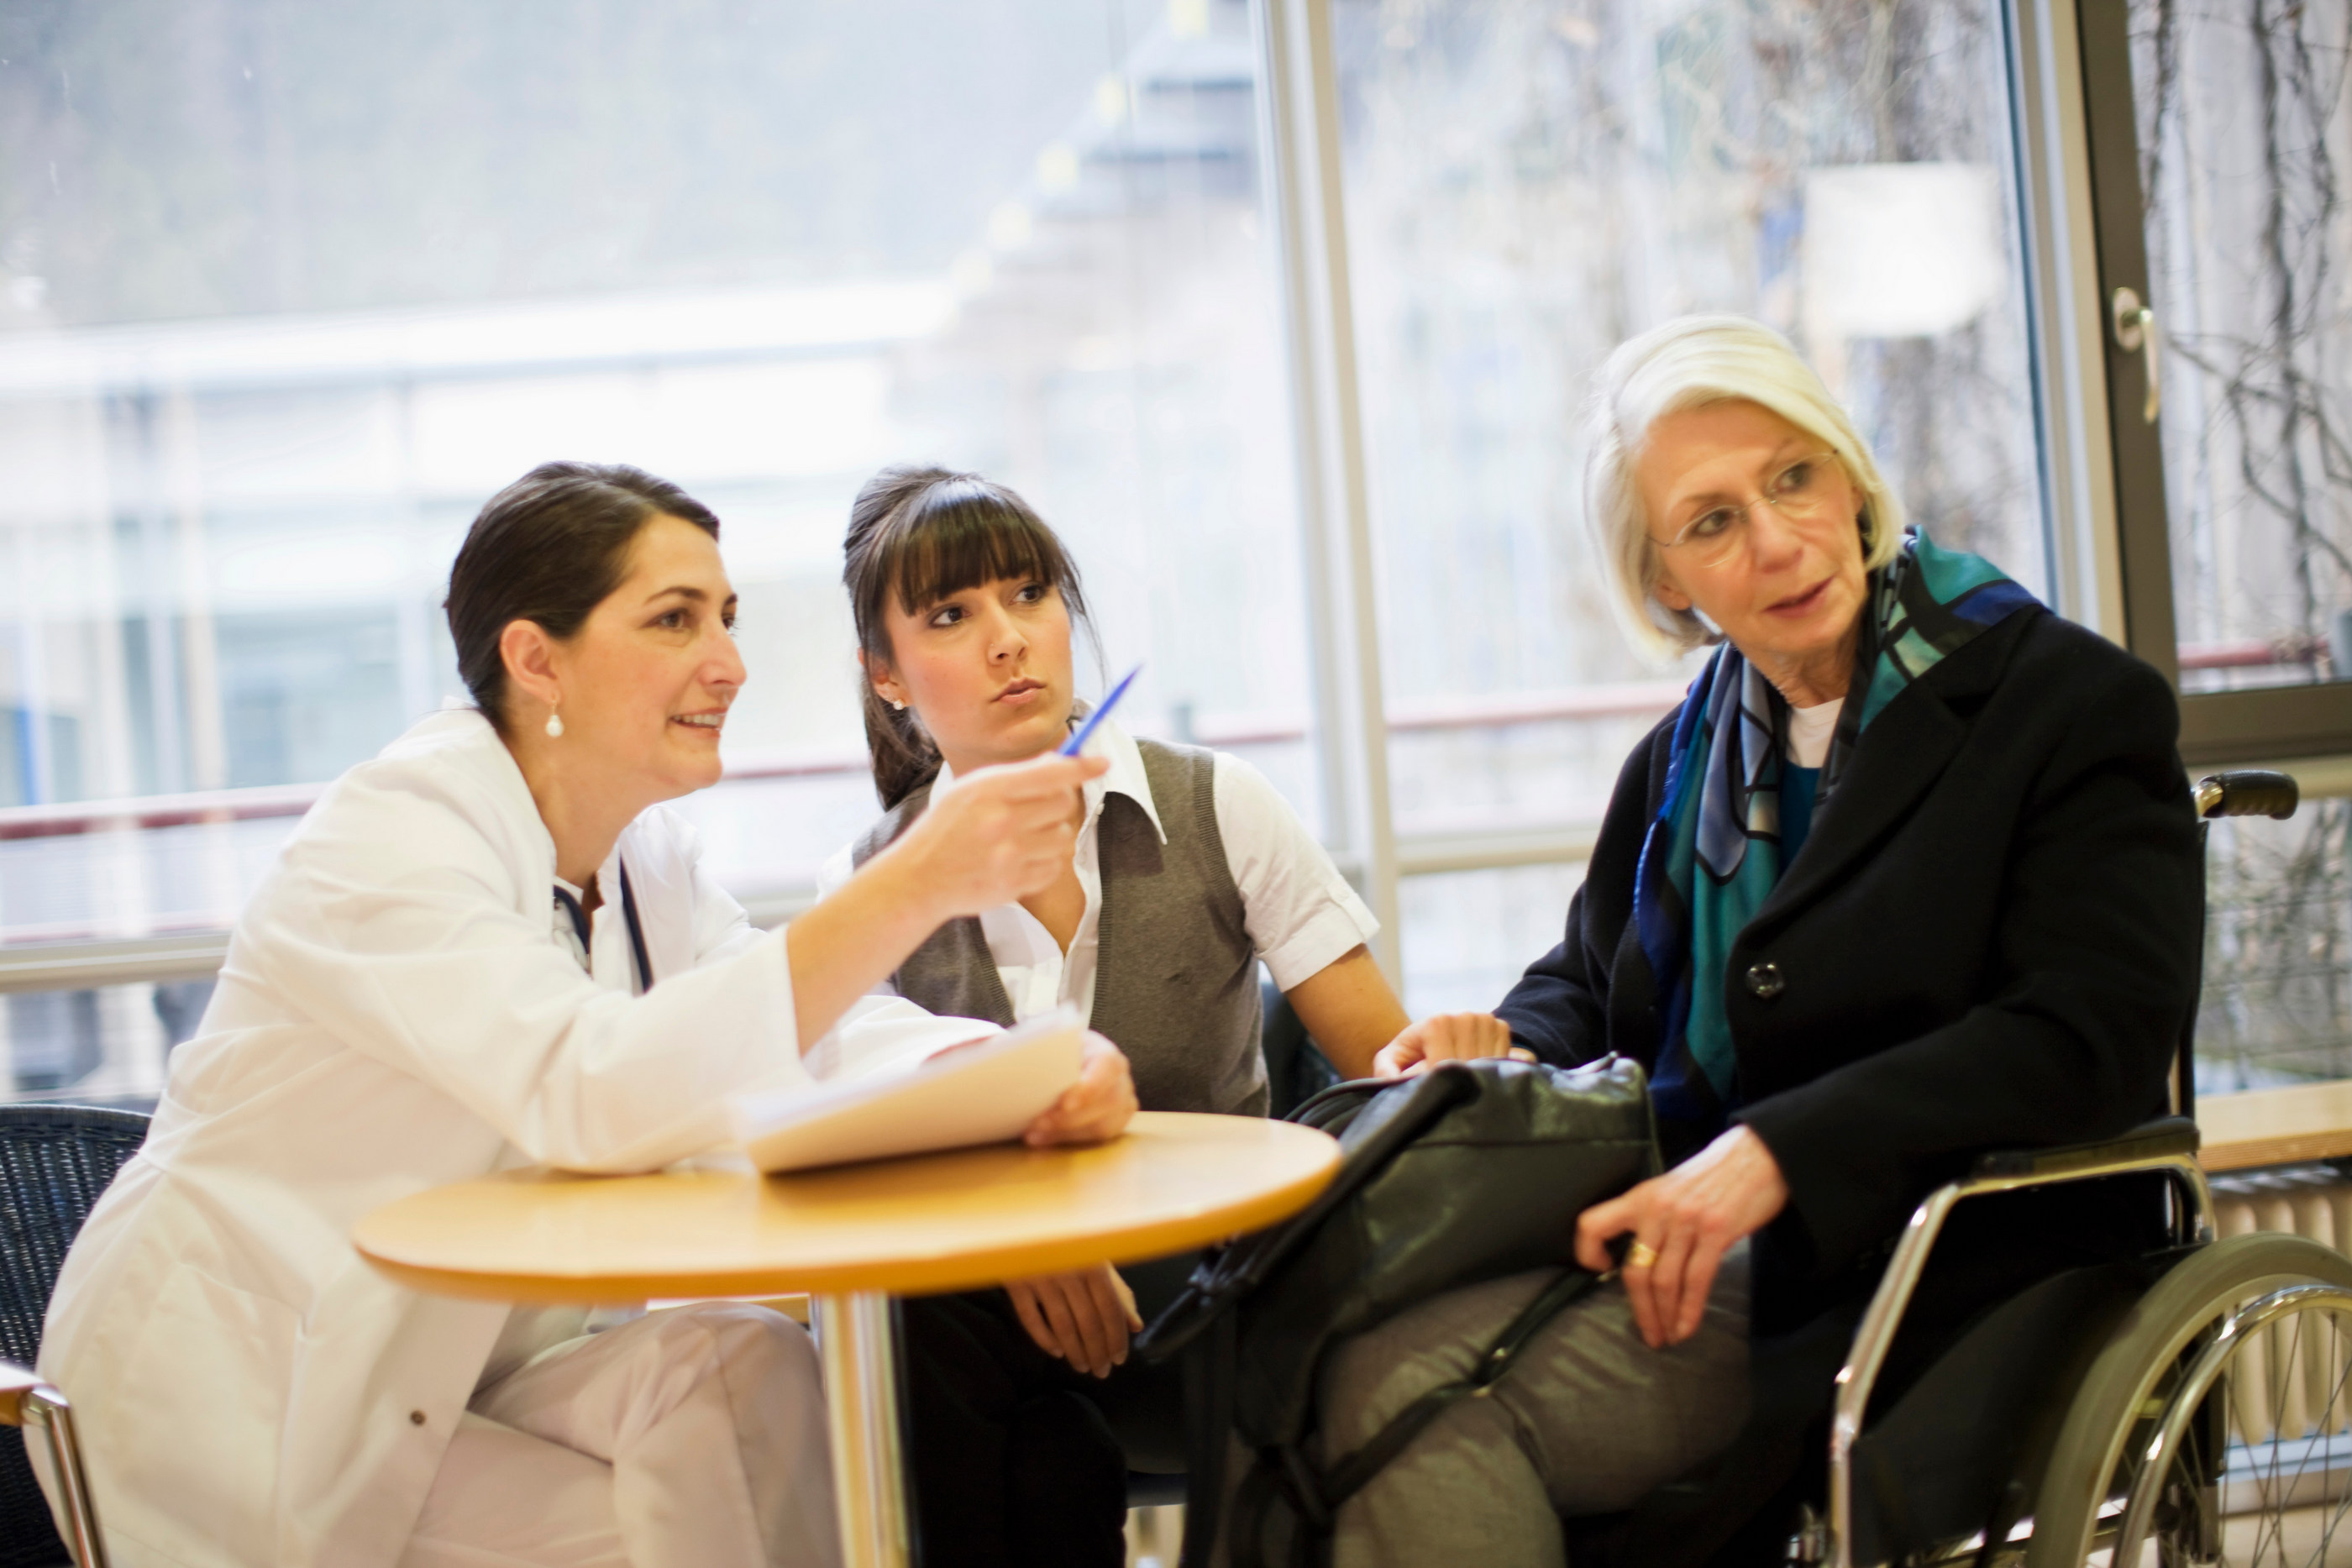 Pårørende i samtale med helsepersonell